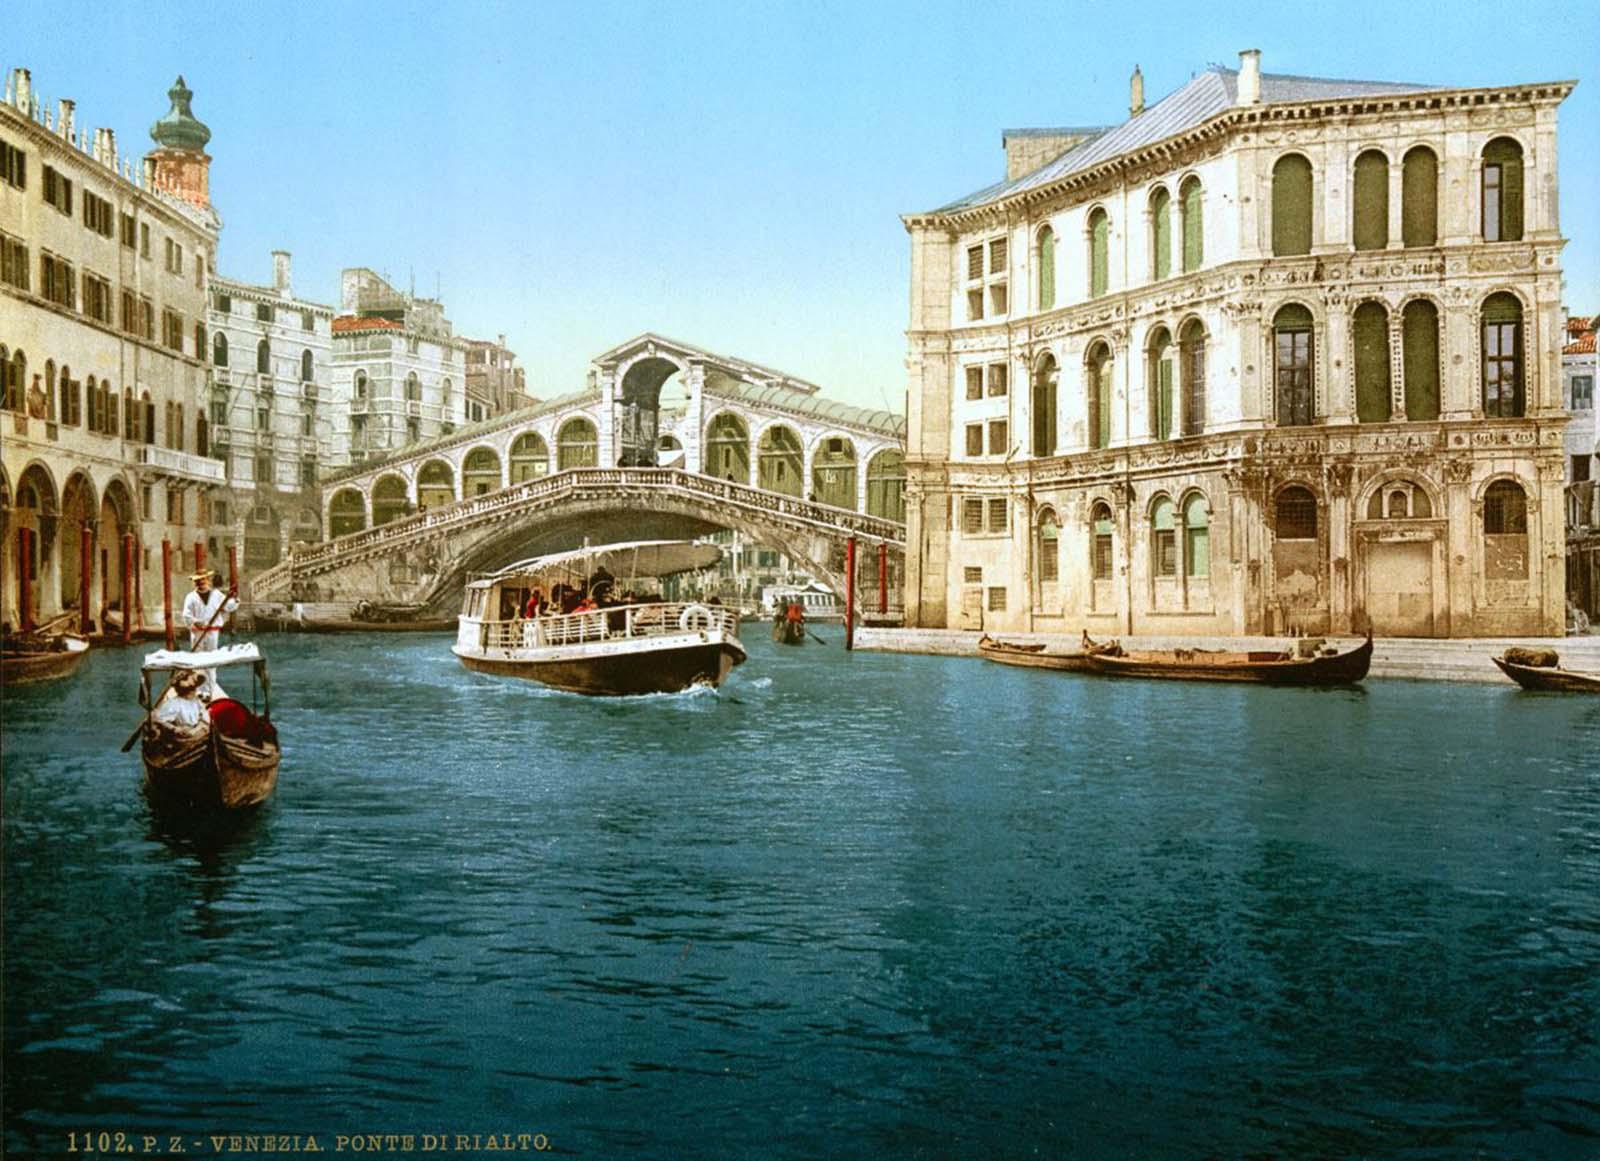 The Grand Canal and the Rialto Bridge.